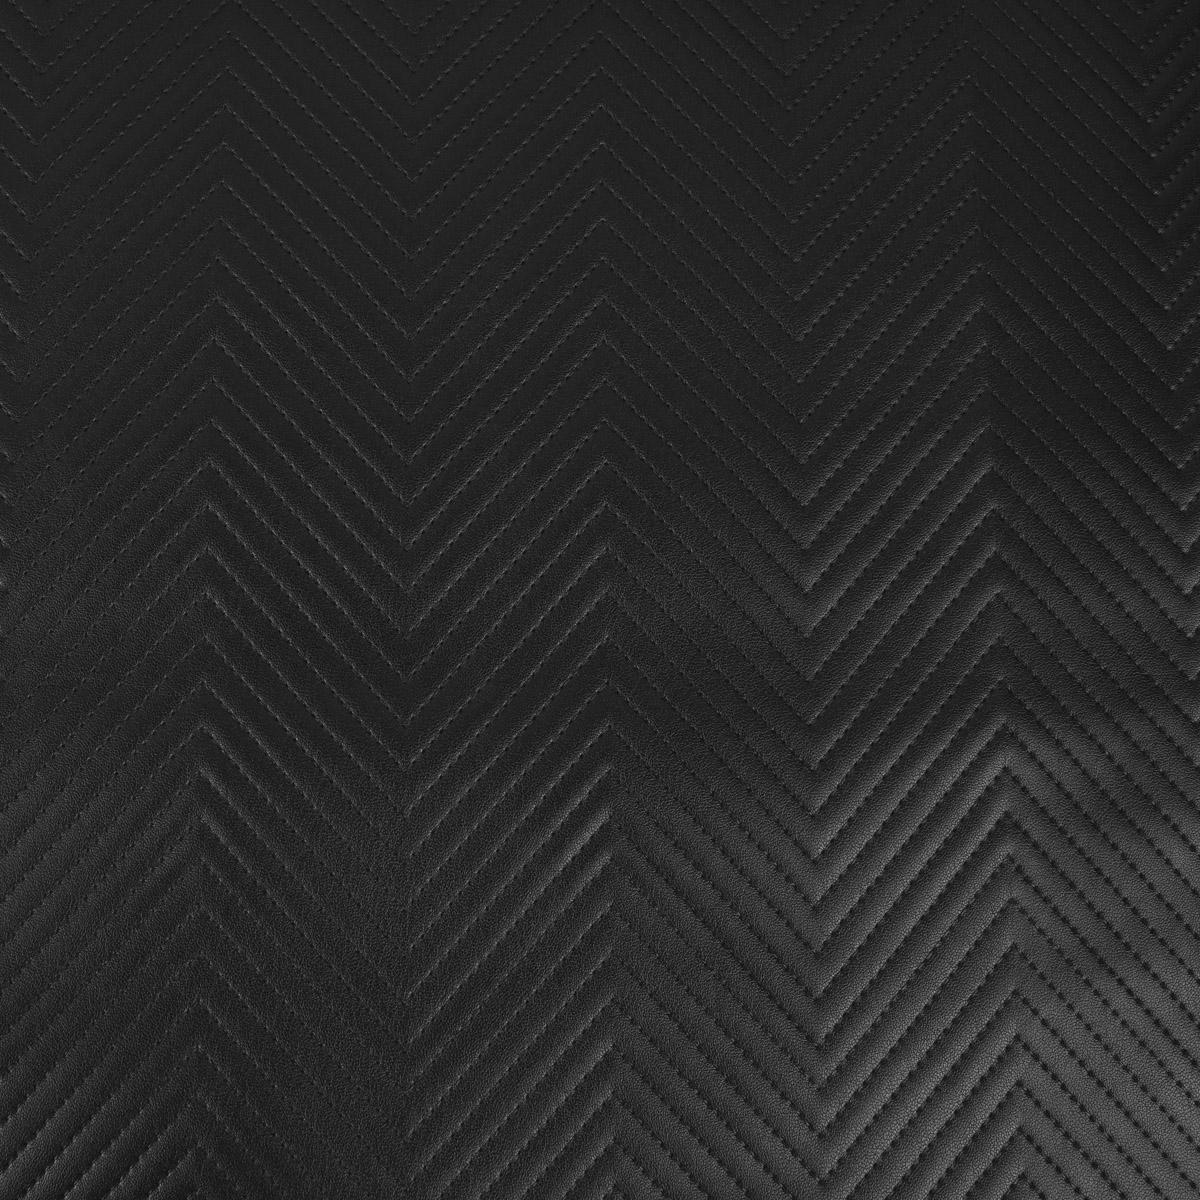 Kunstleder Lederimitat Steppung Zickzack schwarz 1,4m Breite